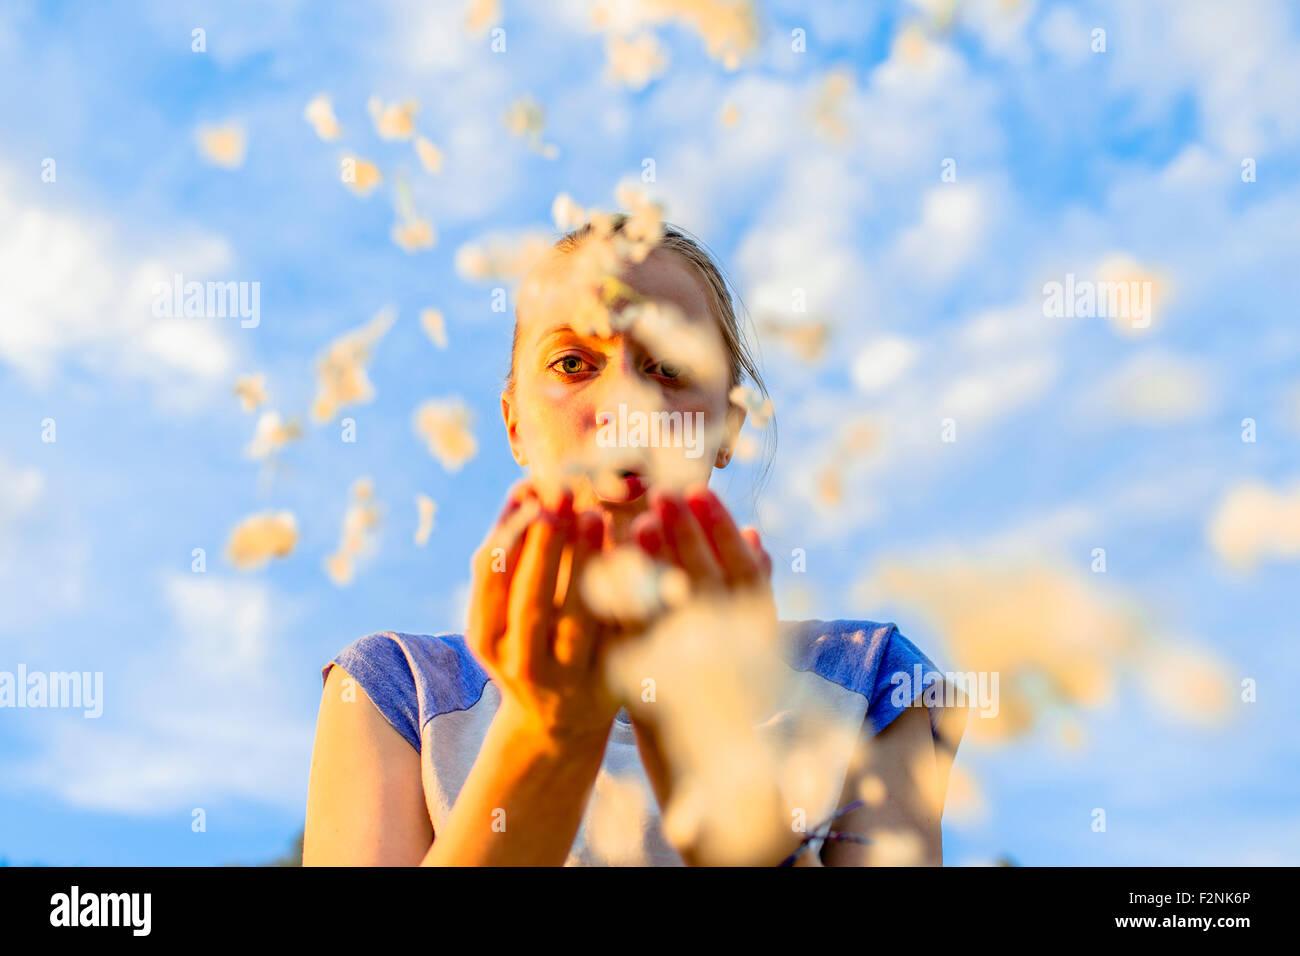 Caucasian teenage girl blowing flower petals under blue sky Stock Photo